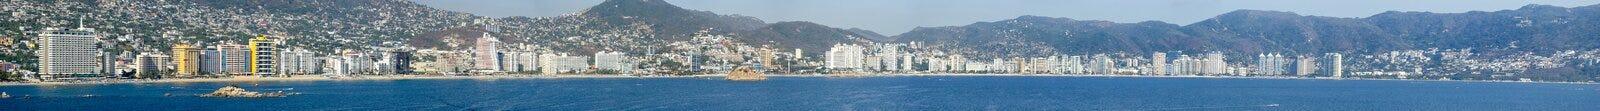 Acapulco-Panorama Stockbilder